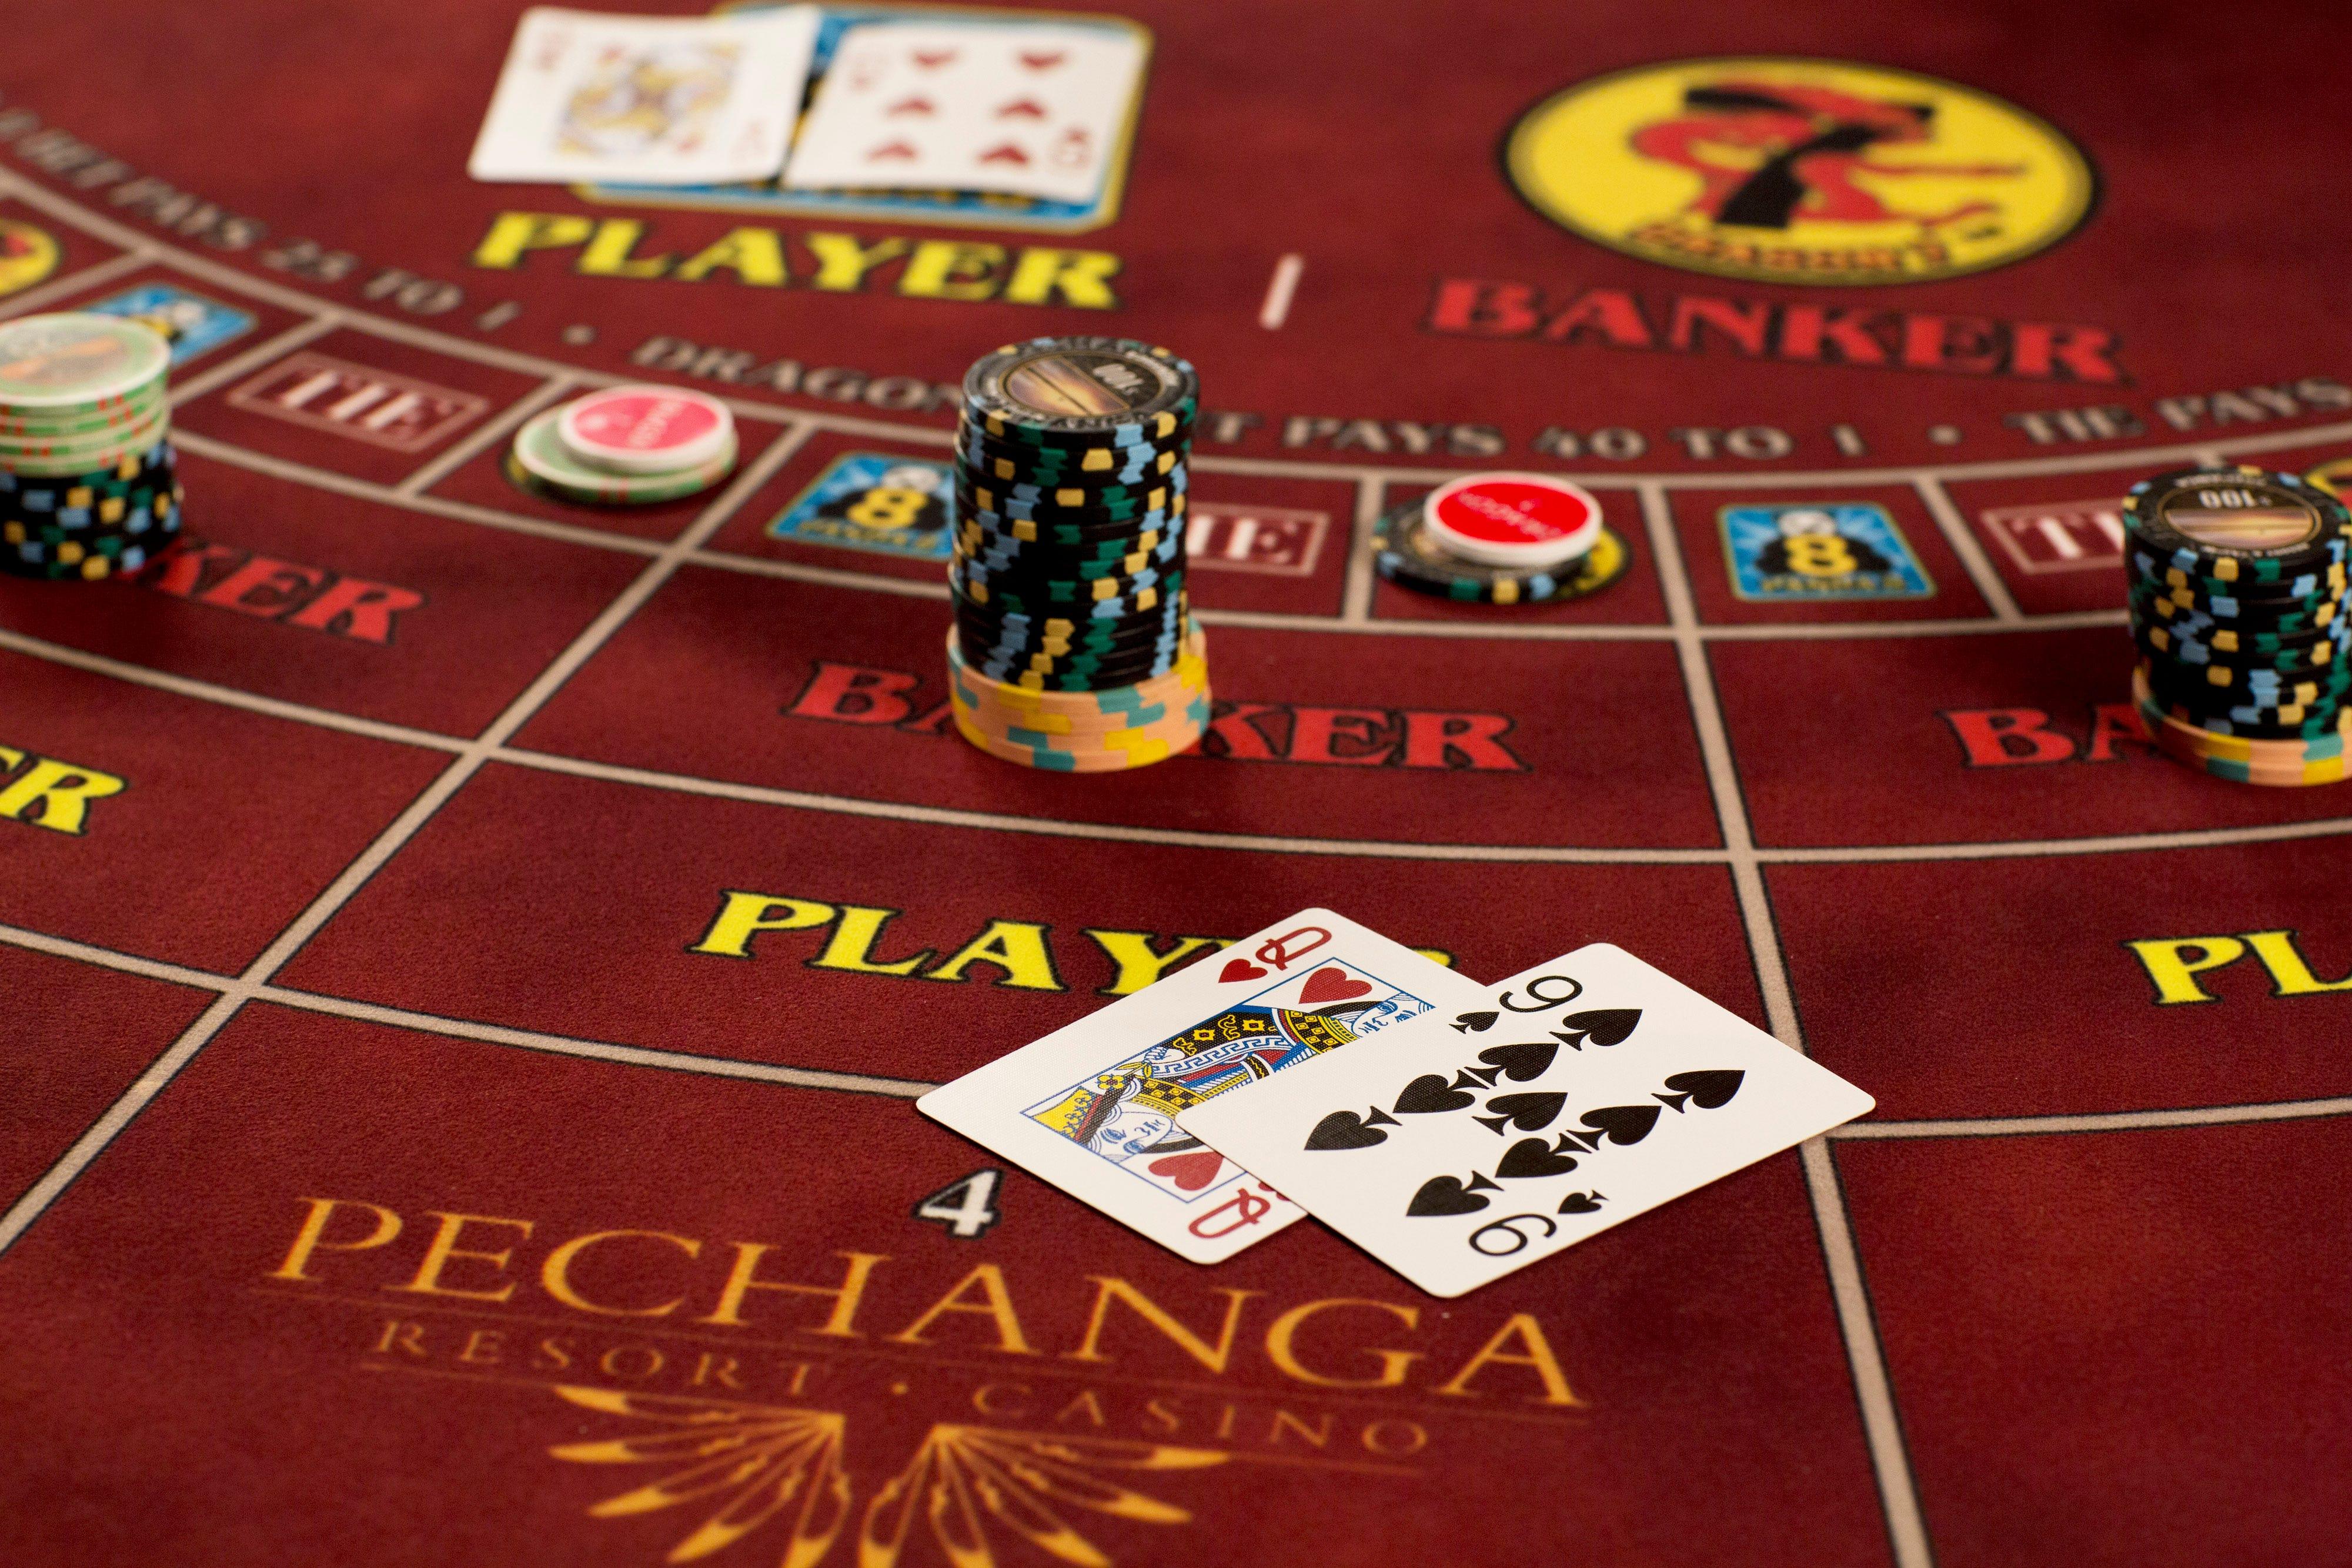 Choice casino gamble plantation history